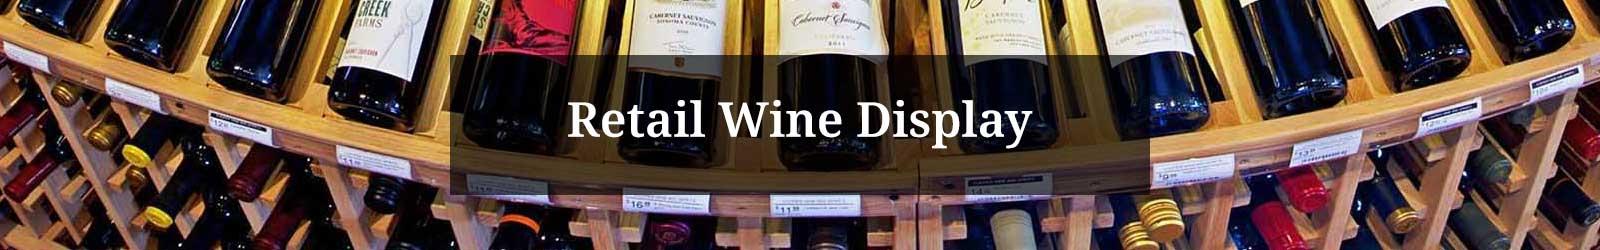 Retail Wine Display